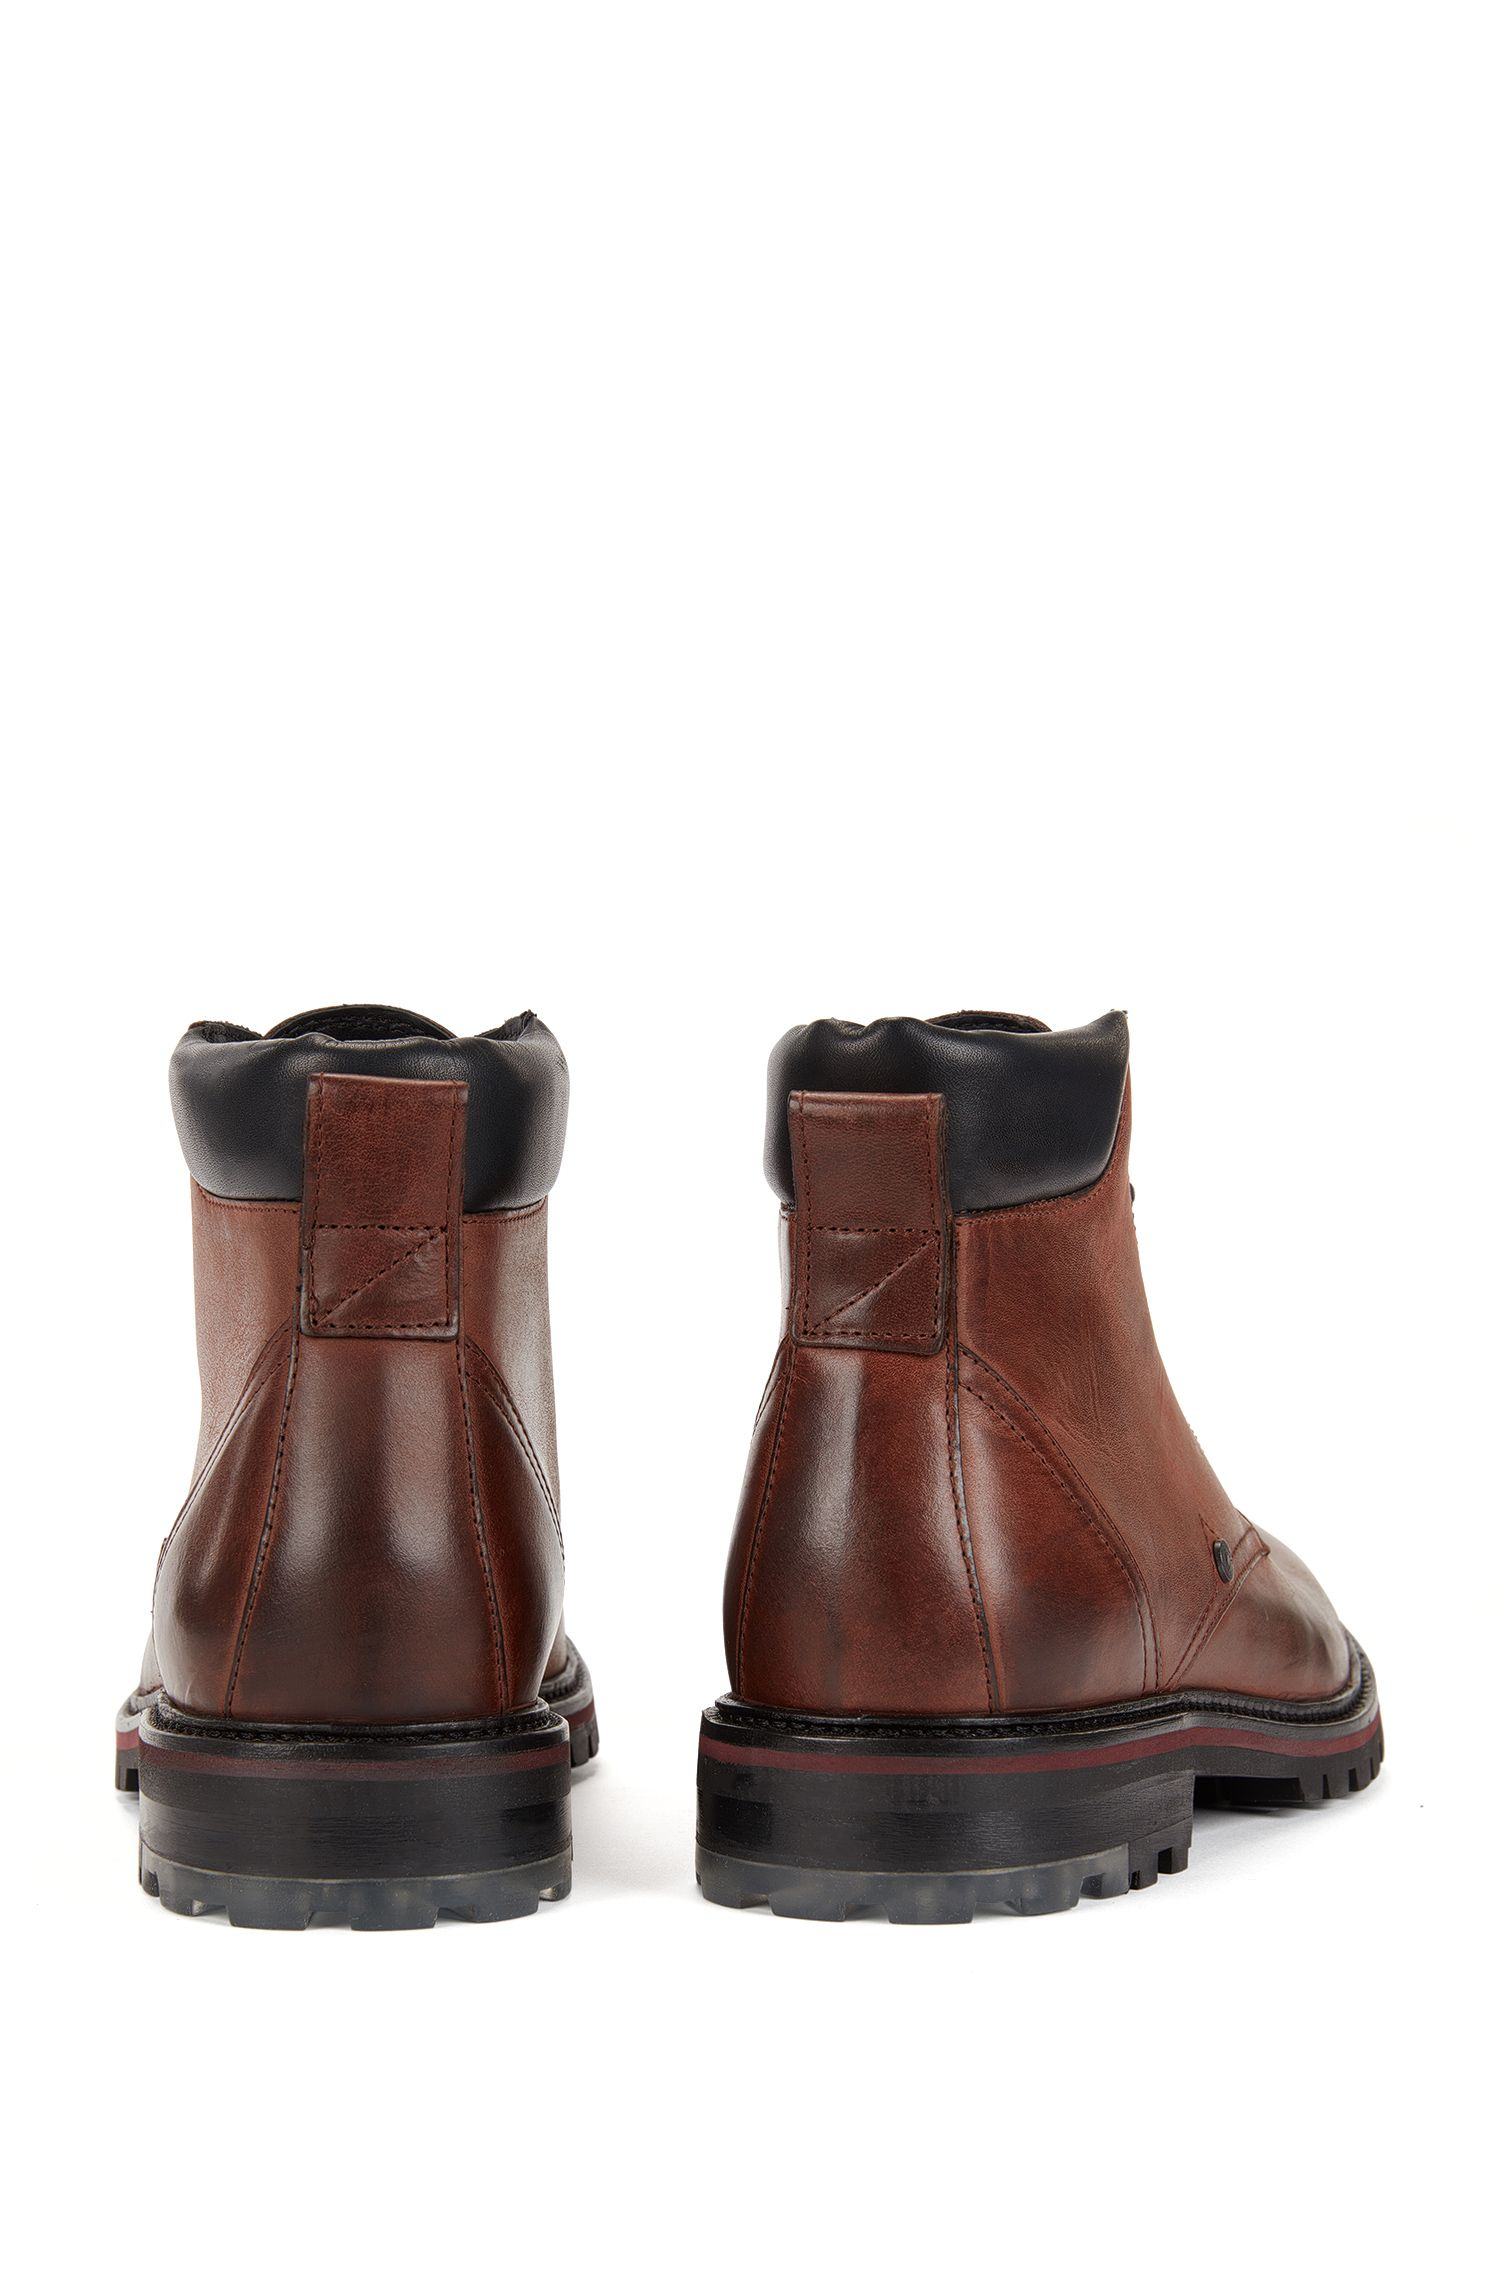 Leather Hiking Boot | Hero Halb Nuwx